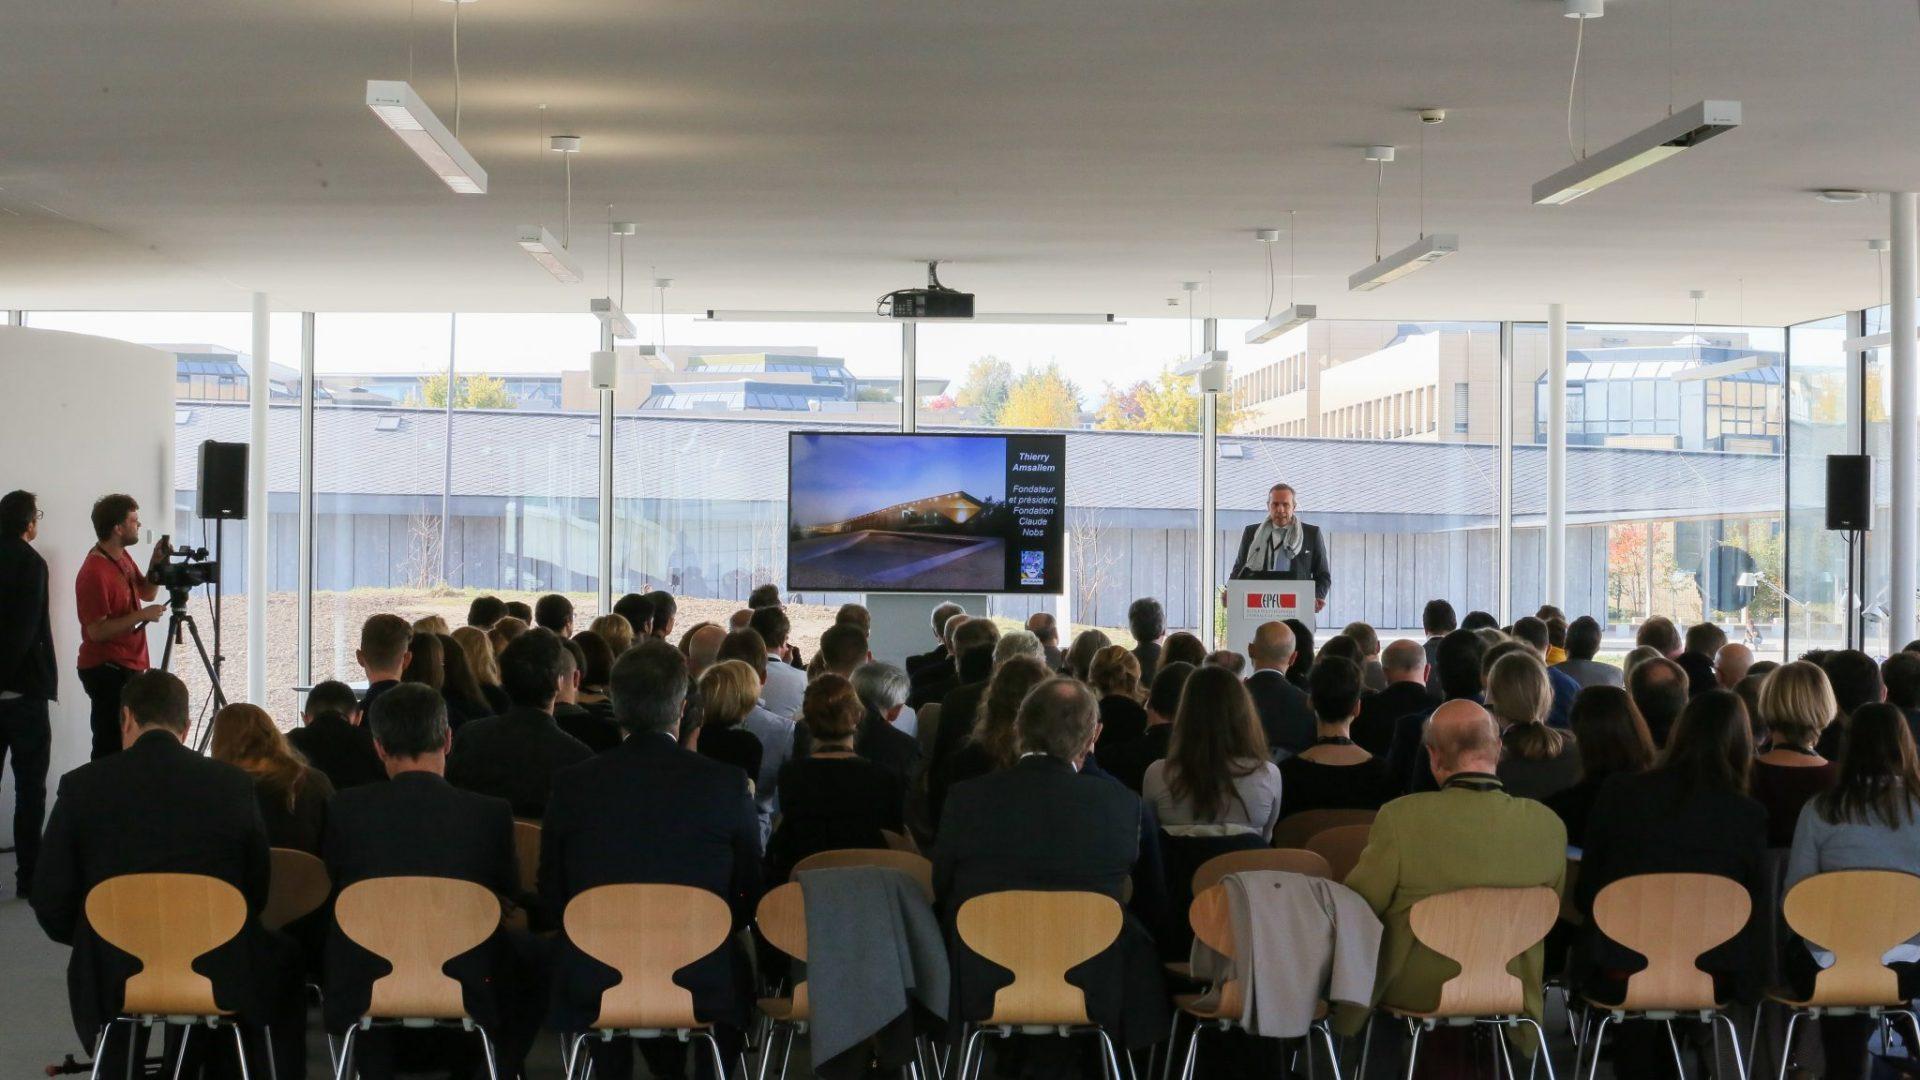 Conférence de presse lors de l'inauguration d'ArtLab